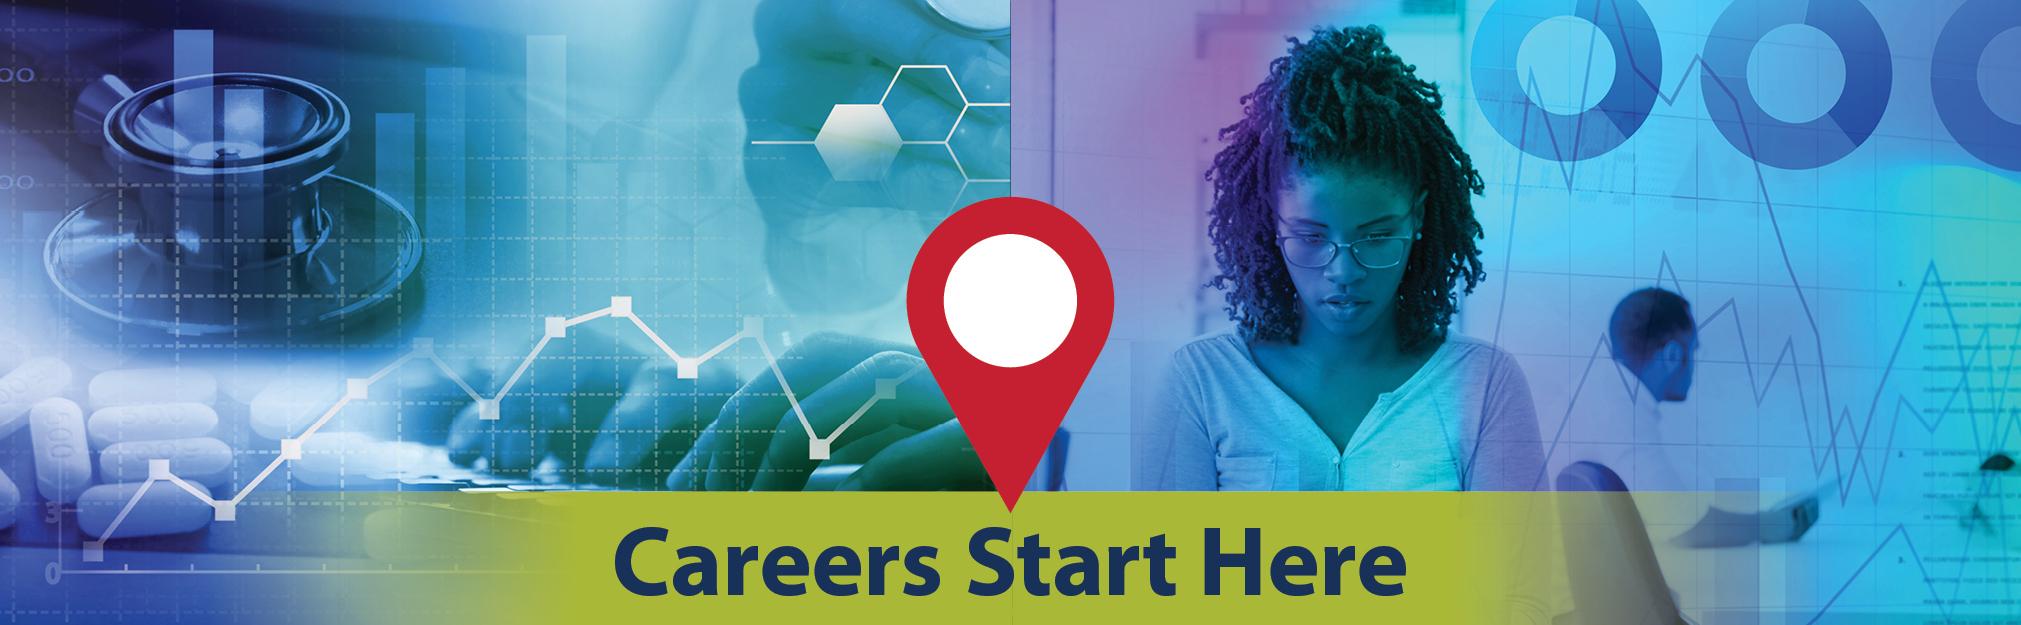 Careers Start Here